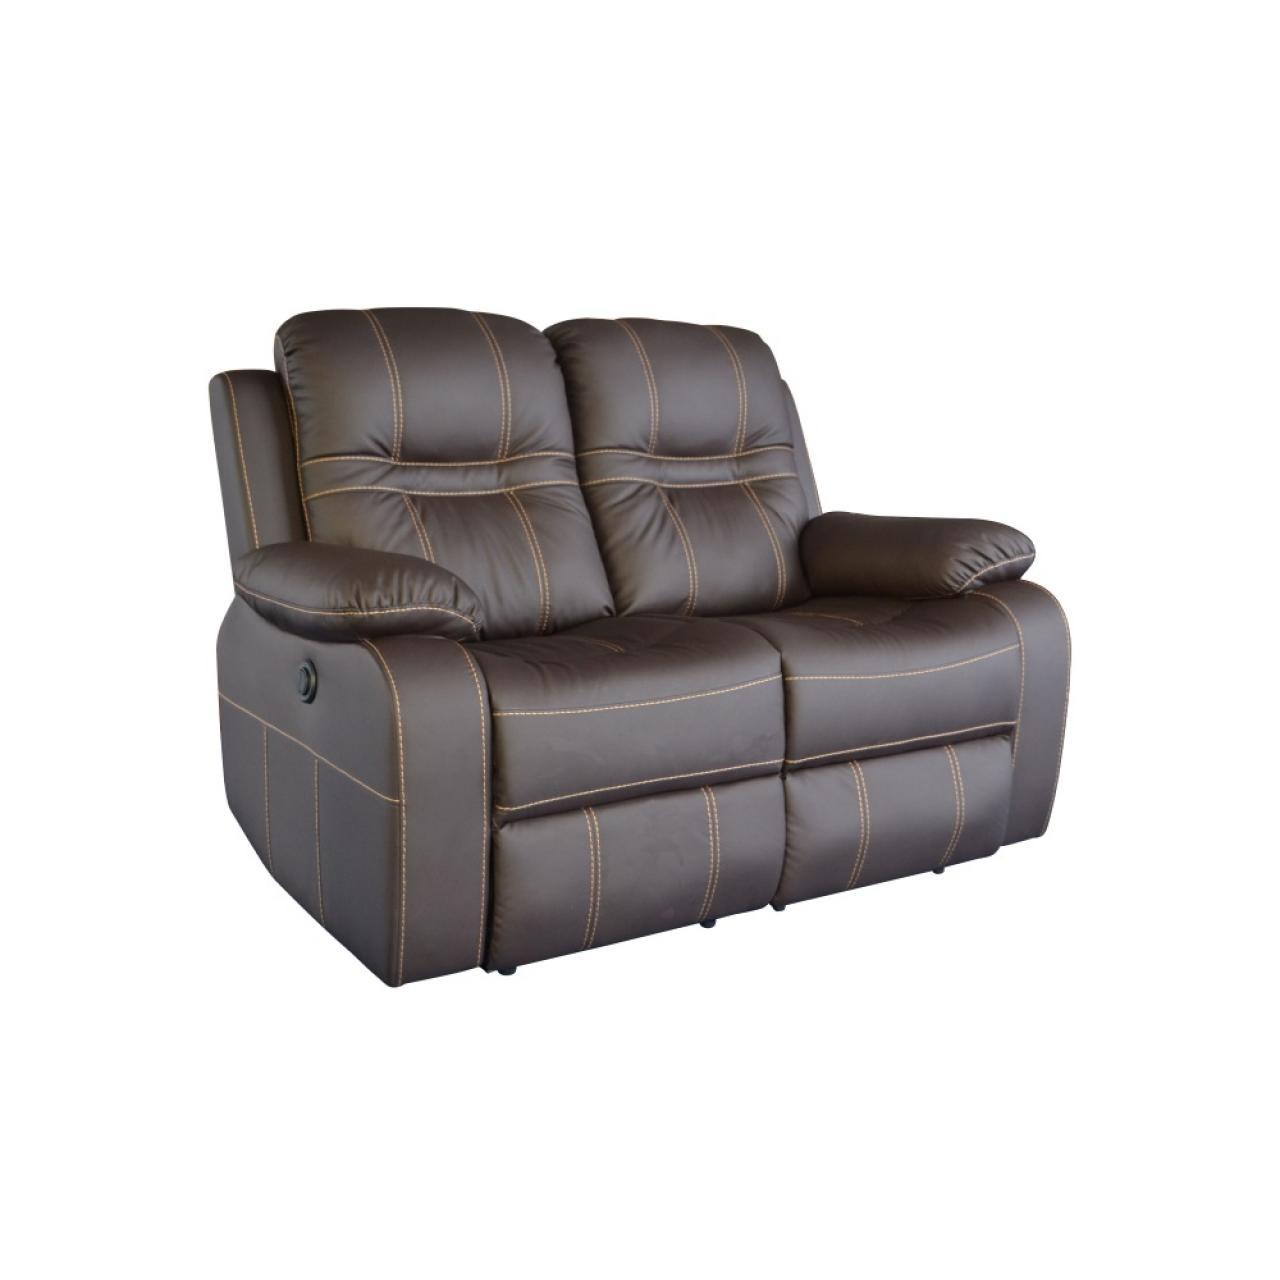 2 sitzer mit relaxfunktion dark coffee relaxsofa couch m bel j hnichen center gmbh. Black Bedroom Furniture Sets. Home Design Ideas